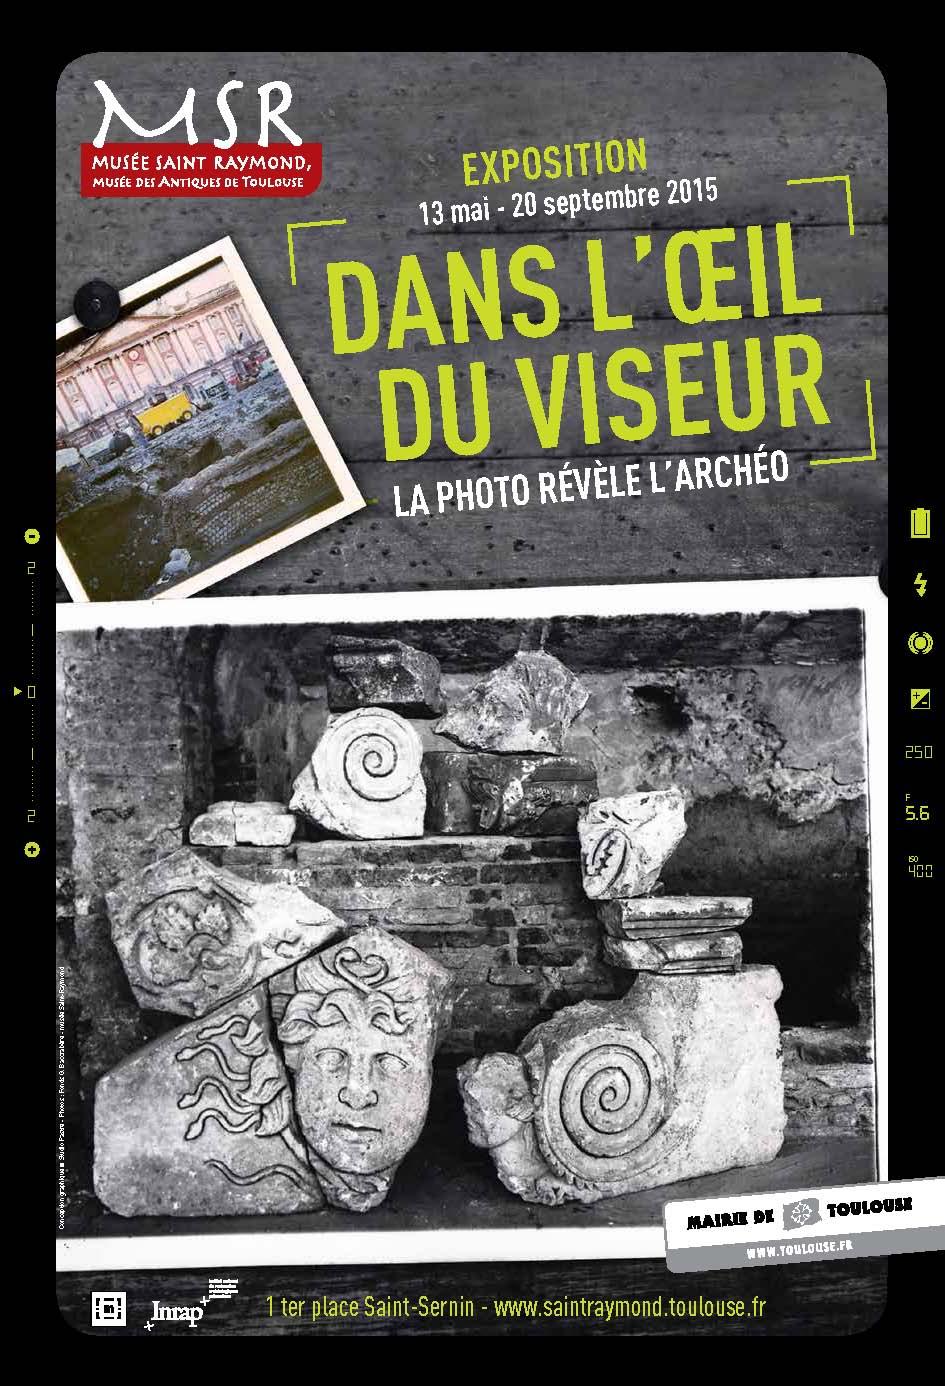 93481_vignette_Aff120x176-DANS-L-OEIL-DU-VISEUR-18fev-1